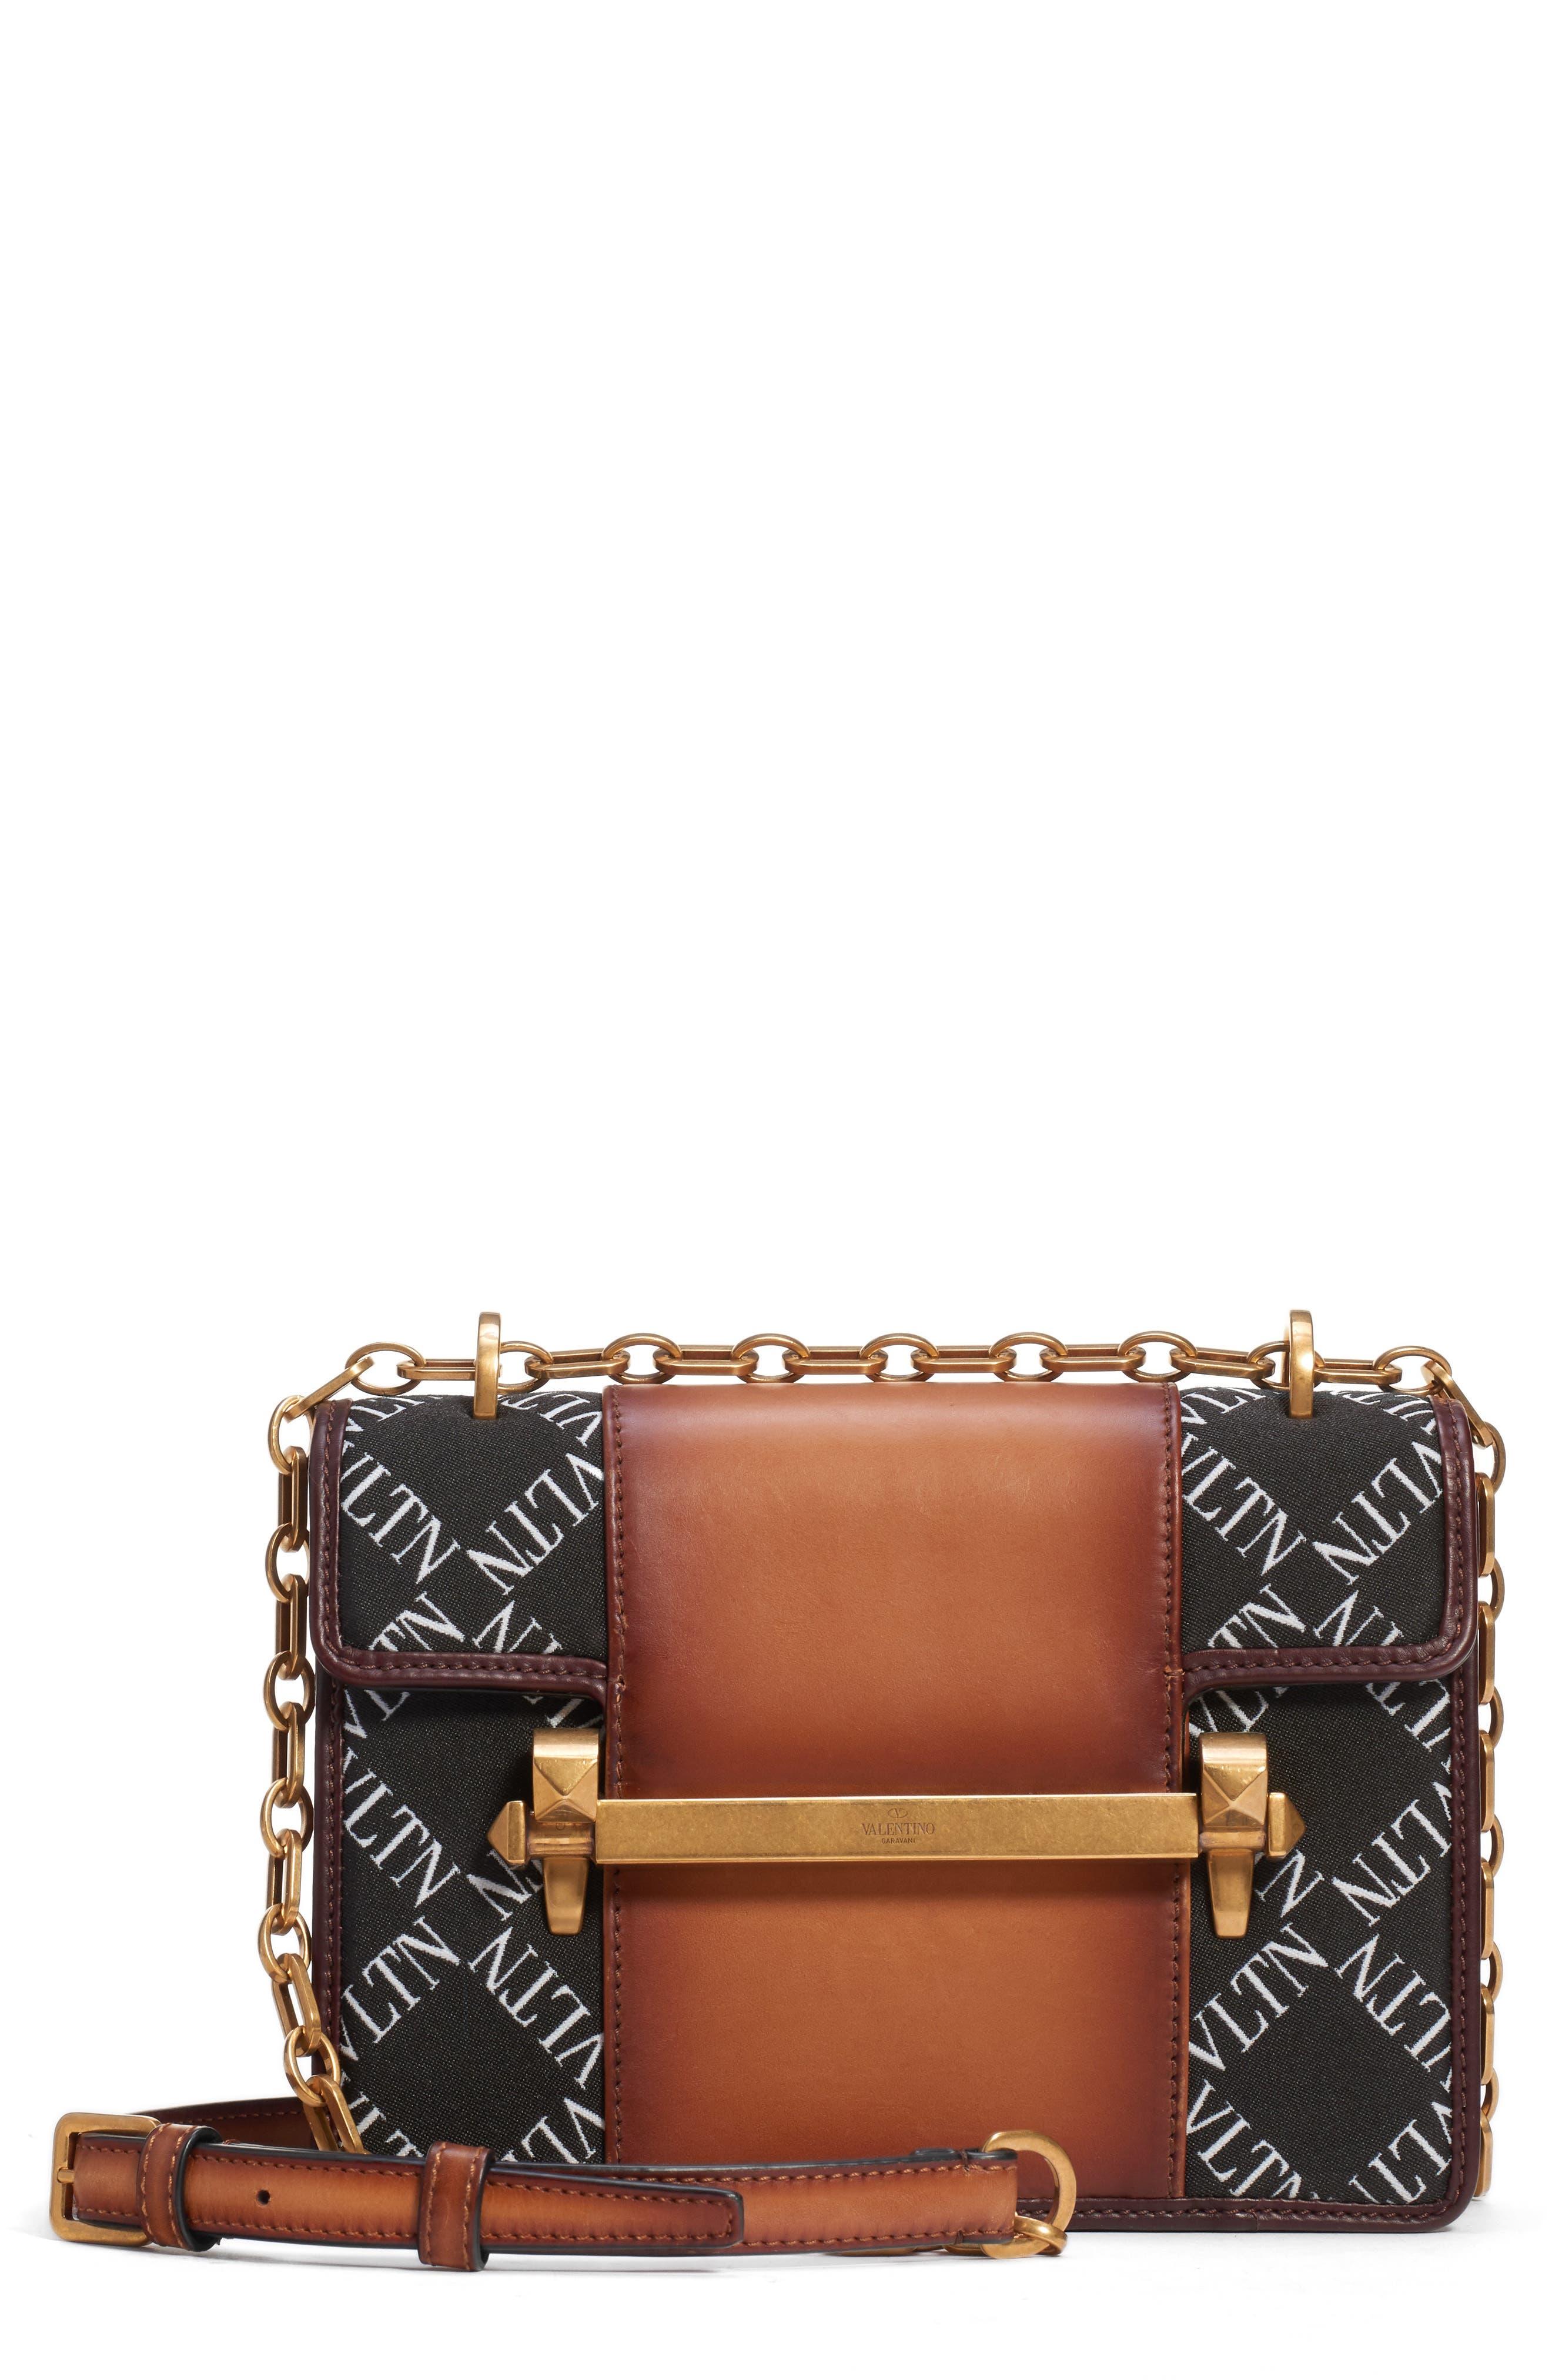 VALENTINO GARAVANI Small Uptown VLTN Logo Shoulder Bag, Main, color, BRIGHT COGNAC/ NERO-BIANCO